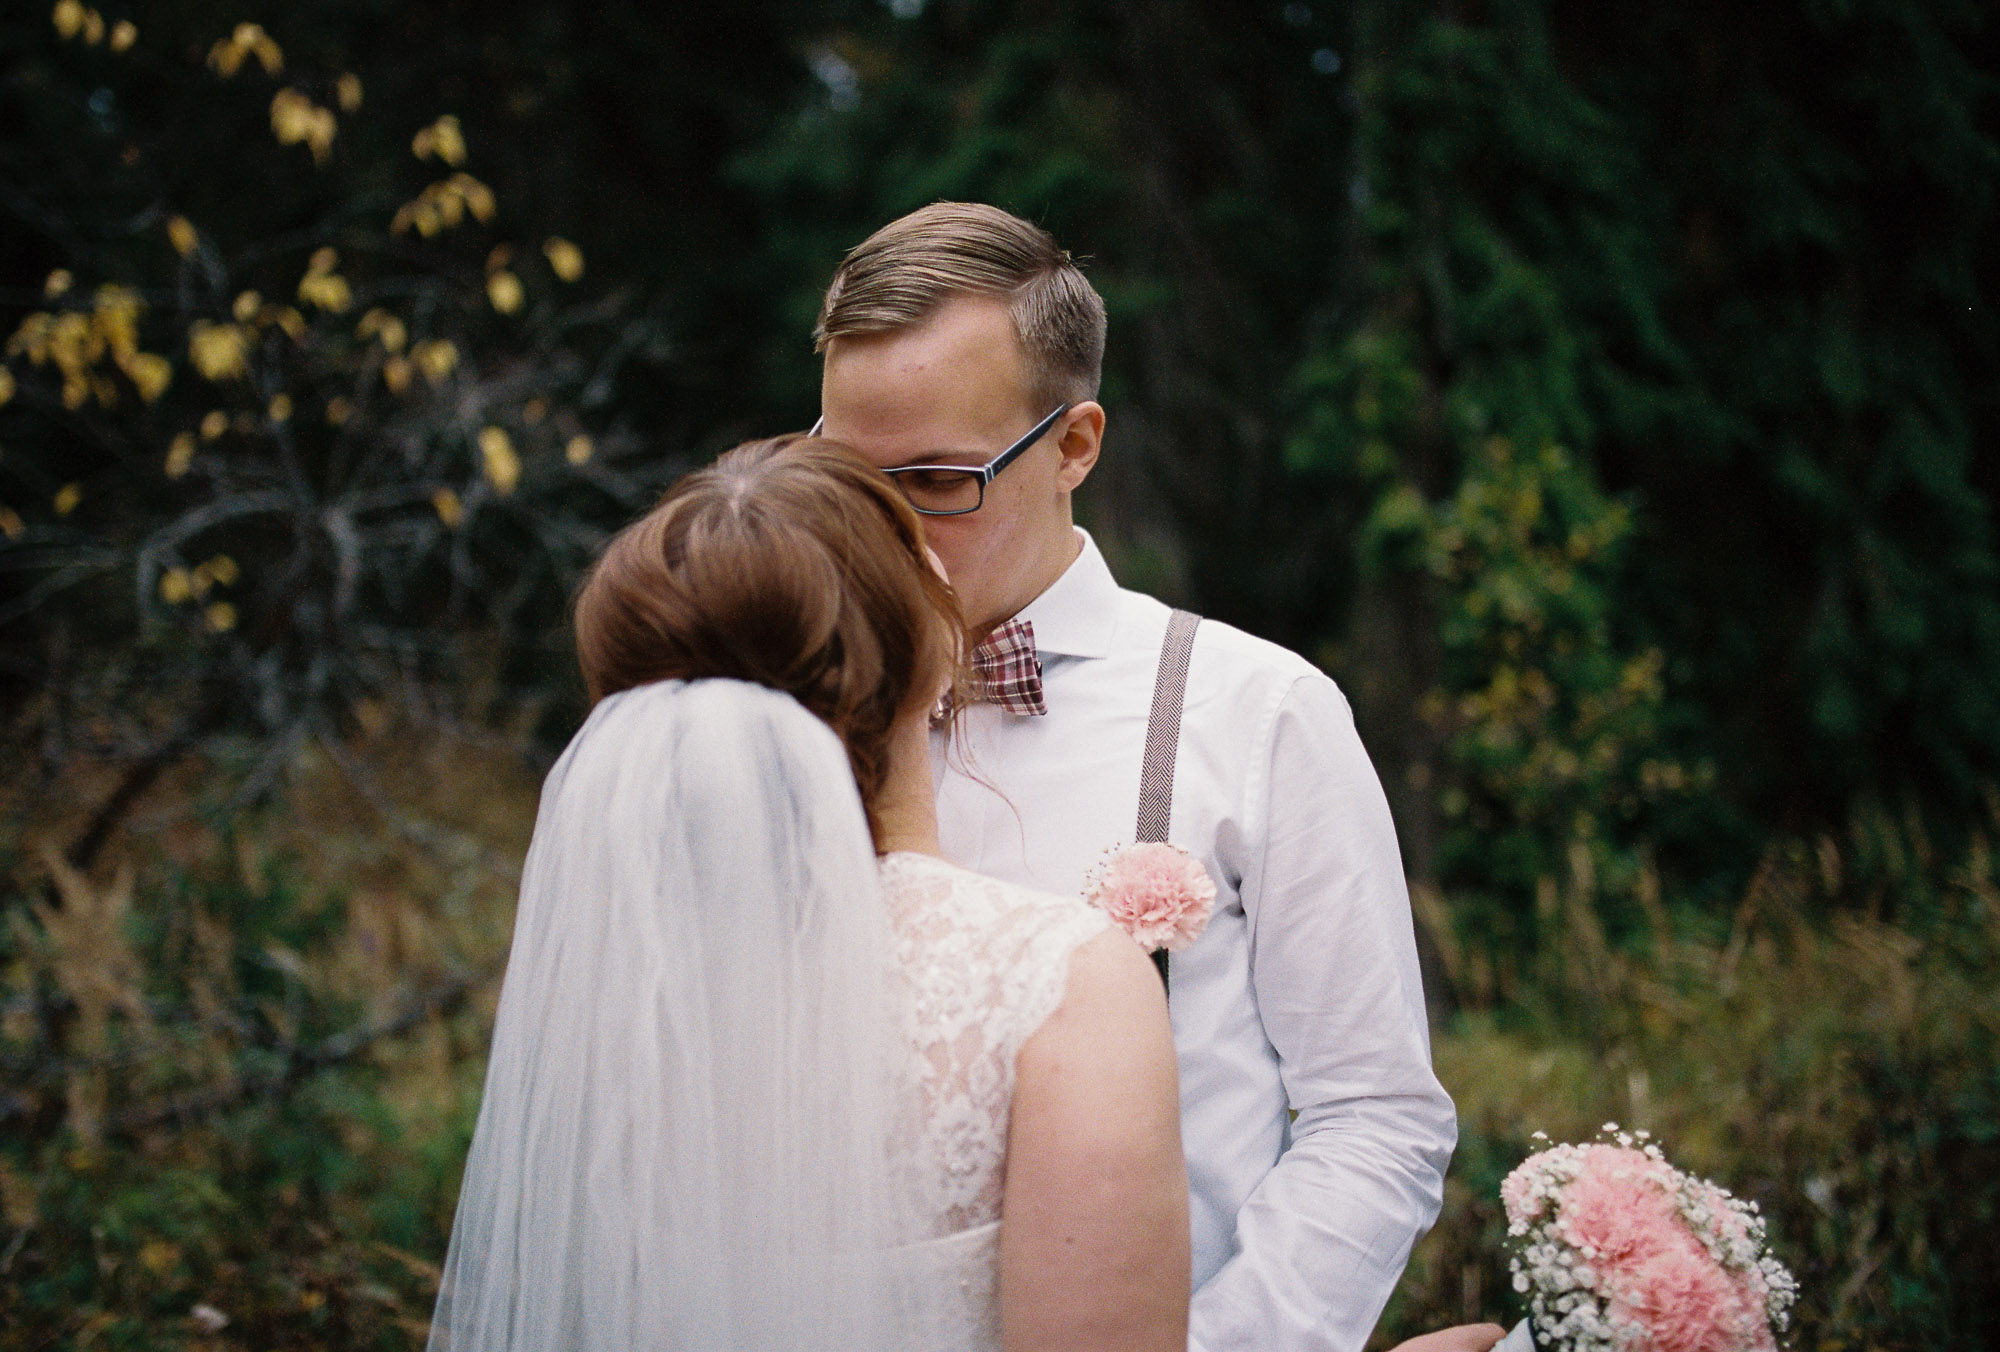 jere-satamo-analog-film-wedding-photographer-finland-073.jpg